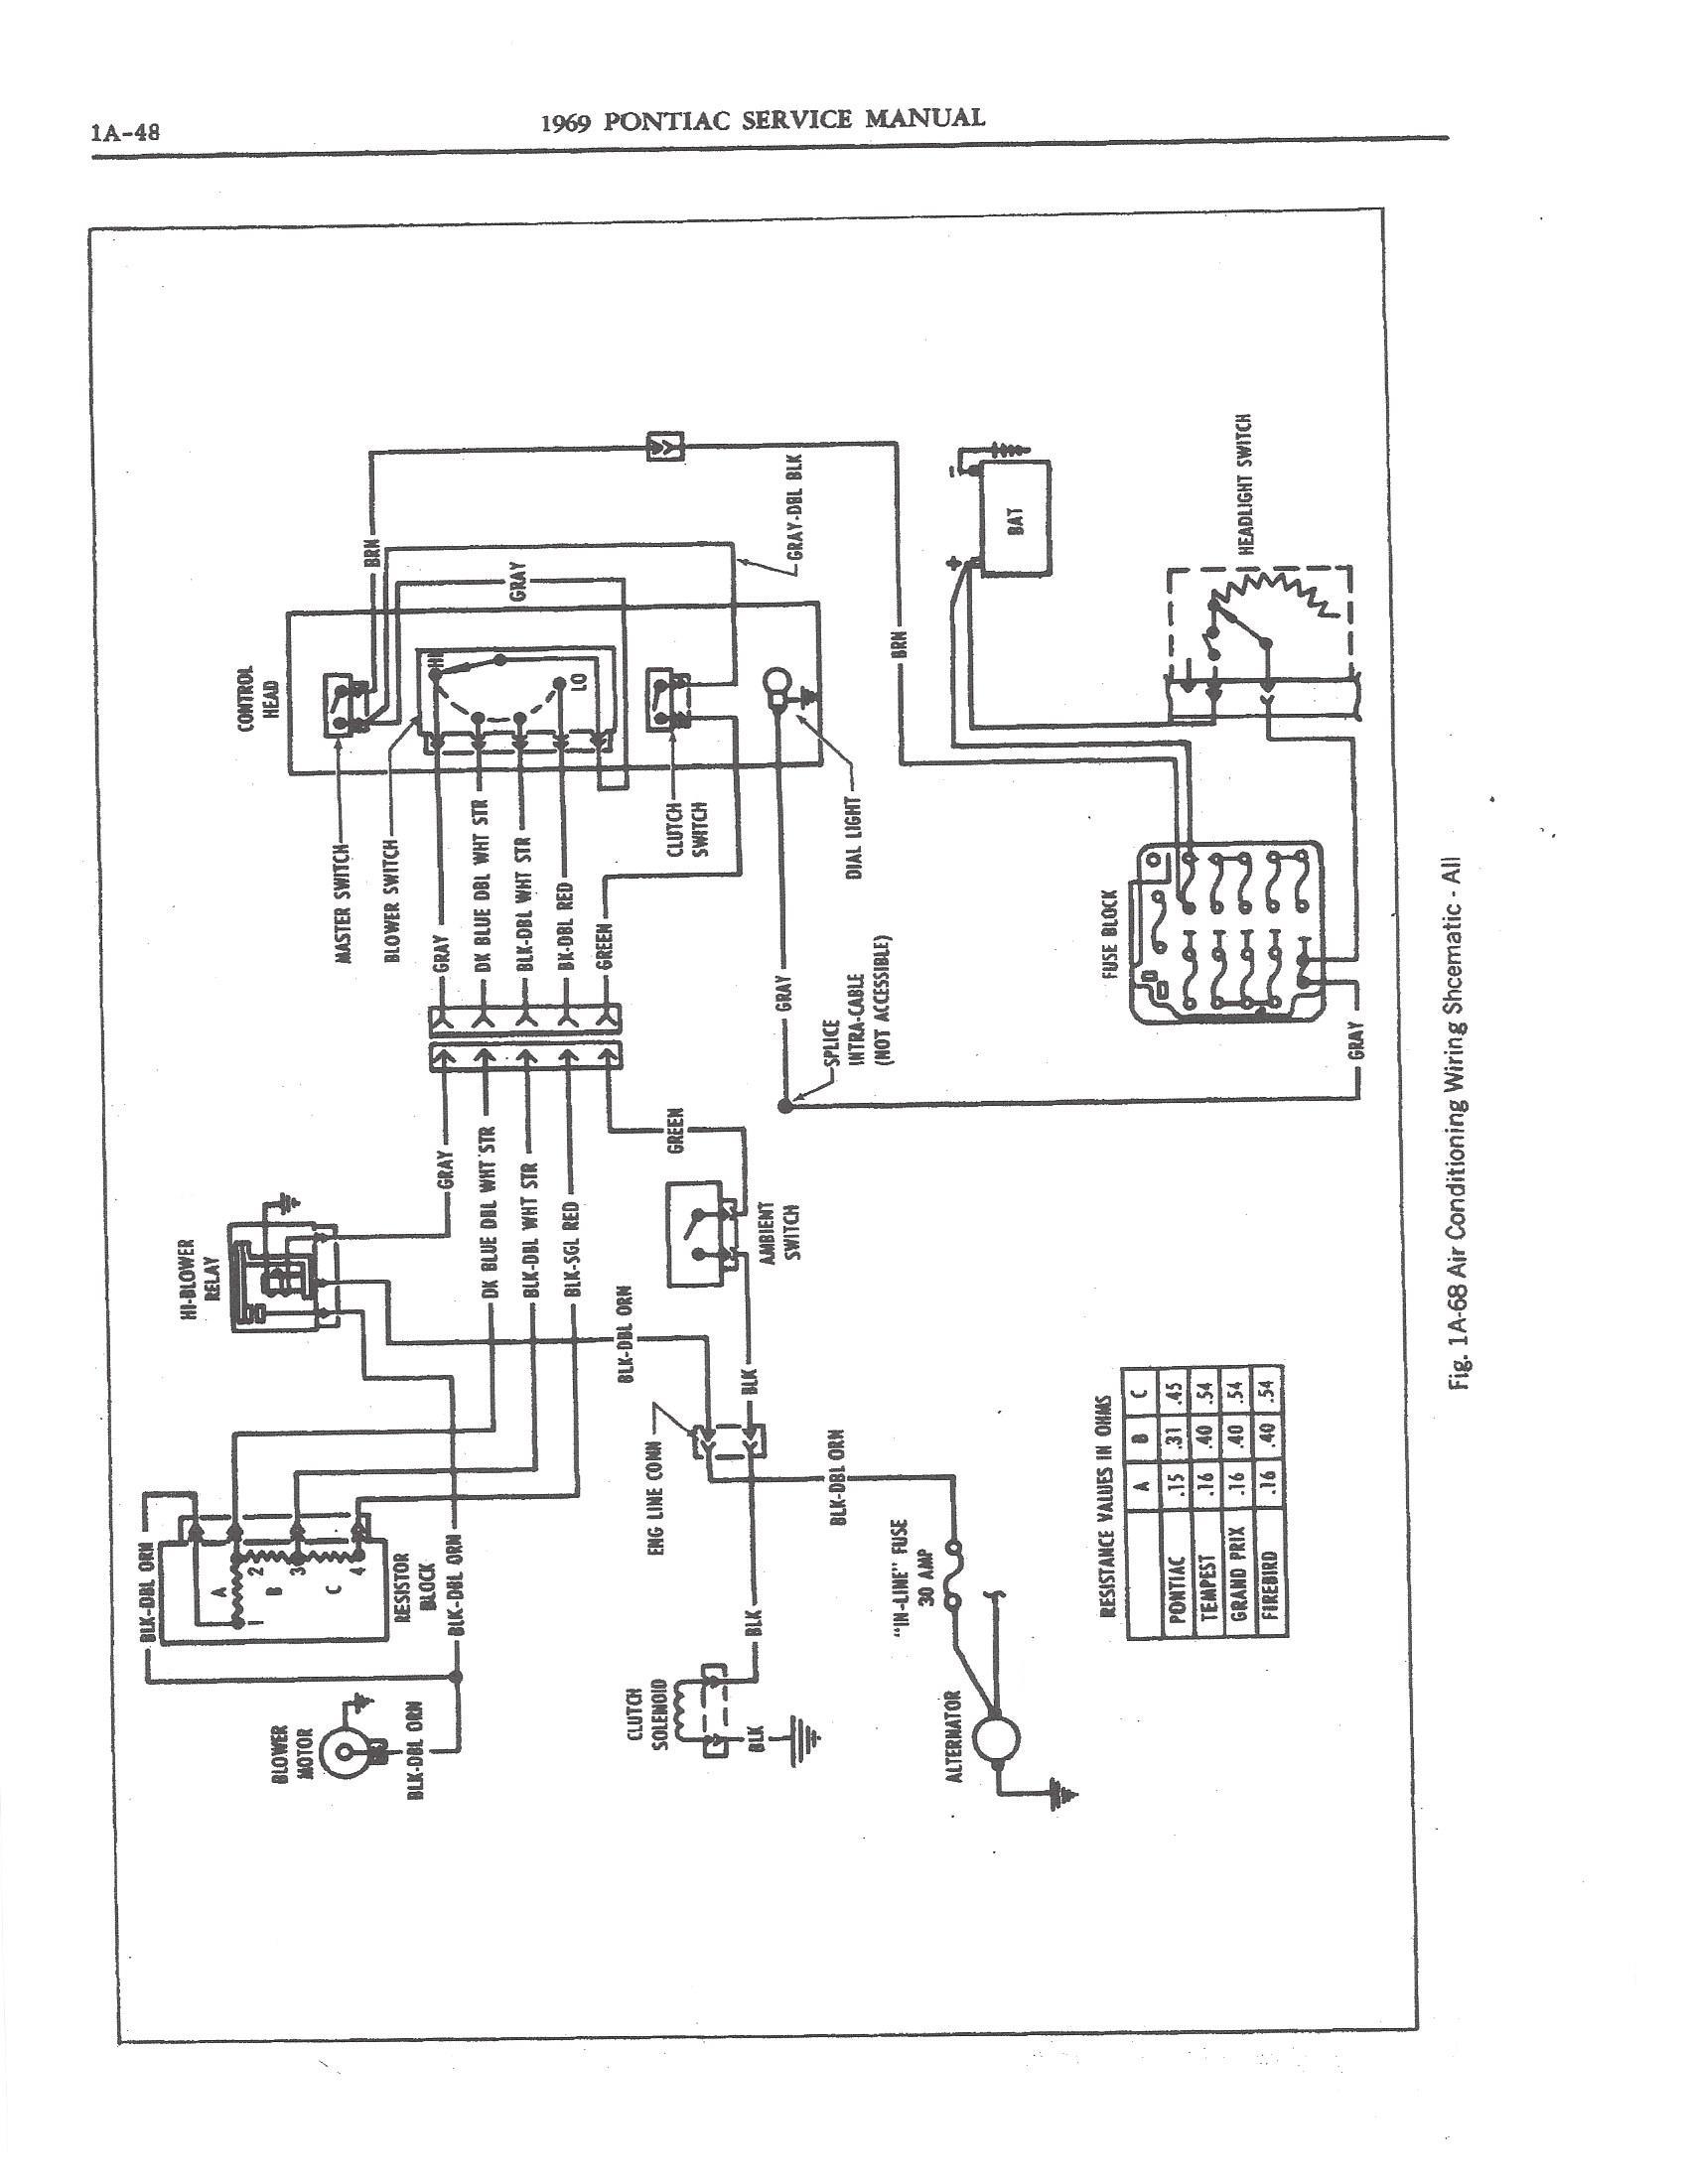 [SCHEMATICS_43NM]  1966 Gto Ac Wiring Schematic 1999 Bmw Z3 Dash Lighting Wiring Diagram -  ct90.kelengkeng.astrea-construction.fr | 1966 Gto Wiring Schematic |  | ASTREA CONSTRUCTION